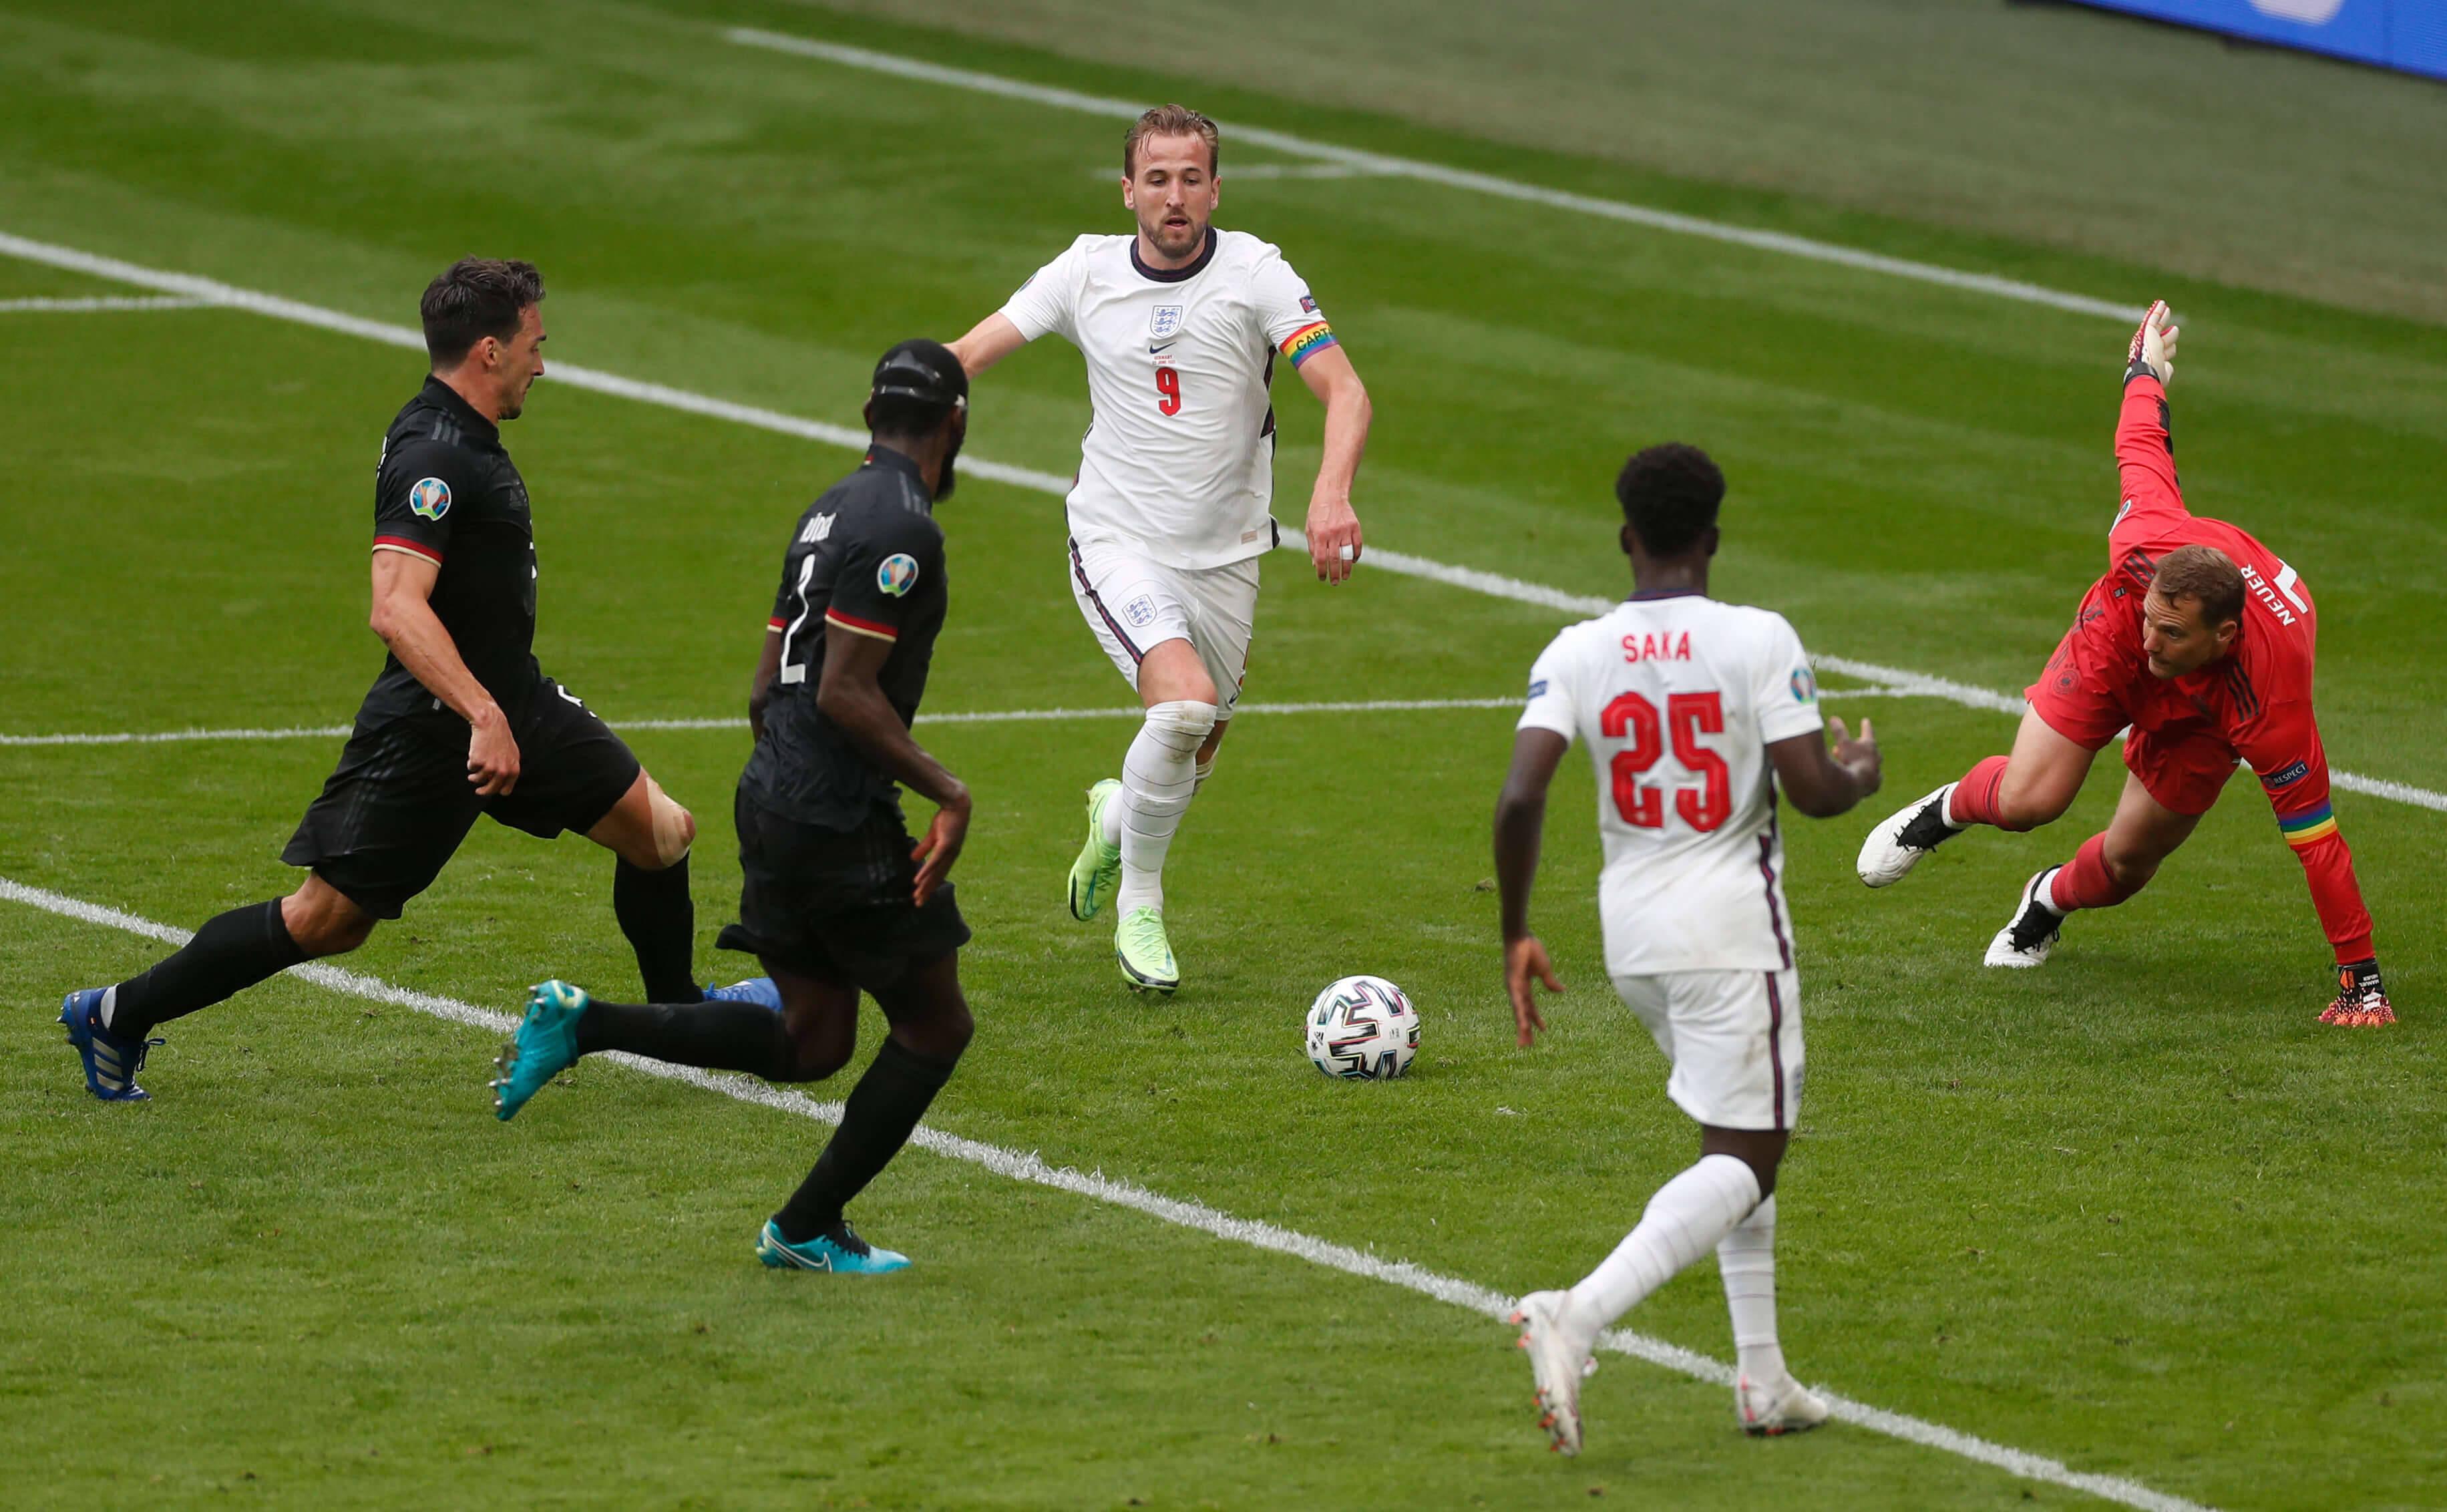 Inglaterra x Alemanha. Foto: Reprodução / Twitter Eurocopa